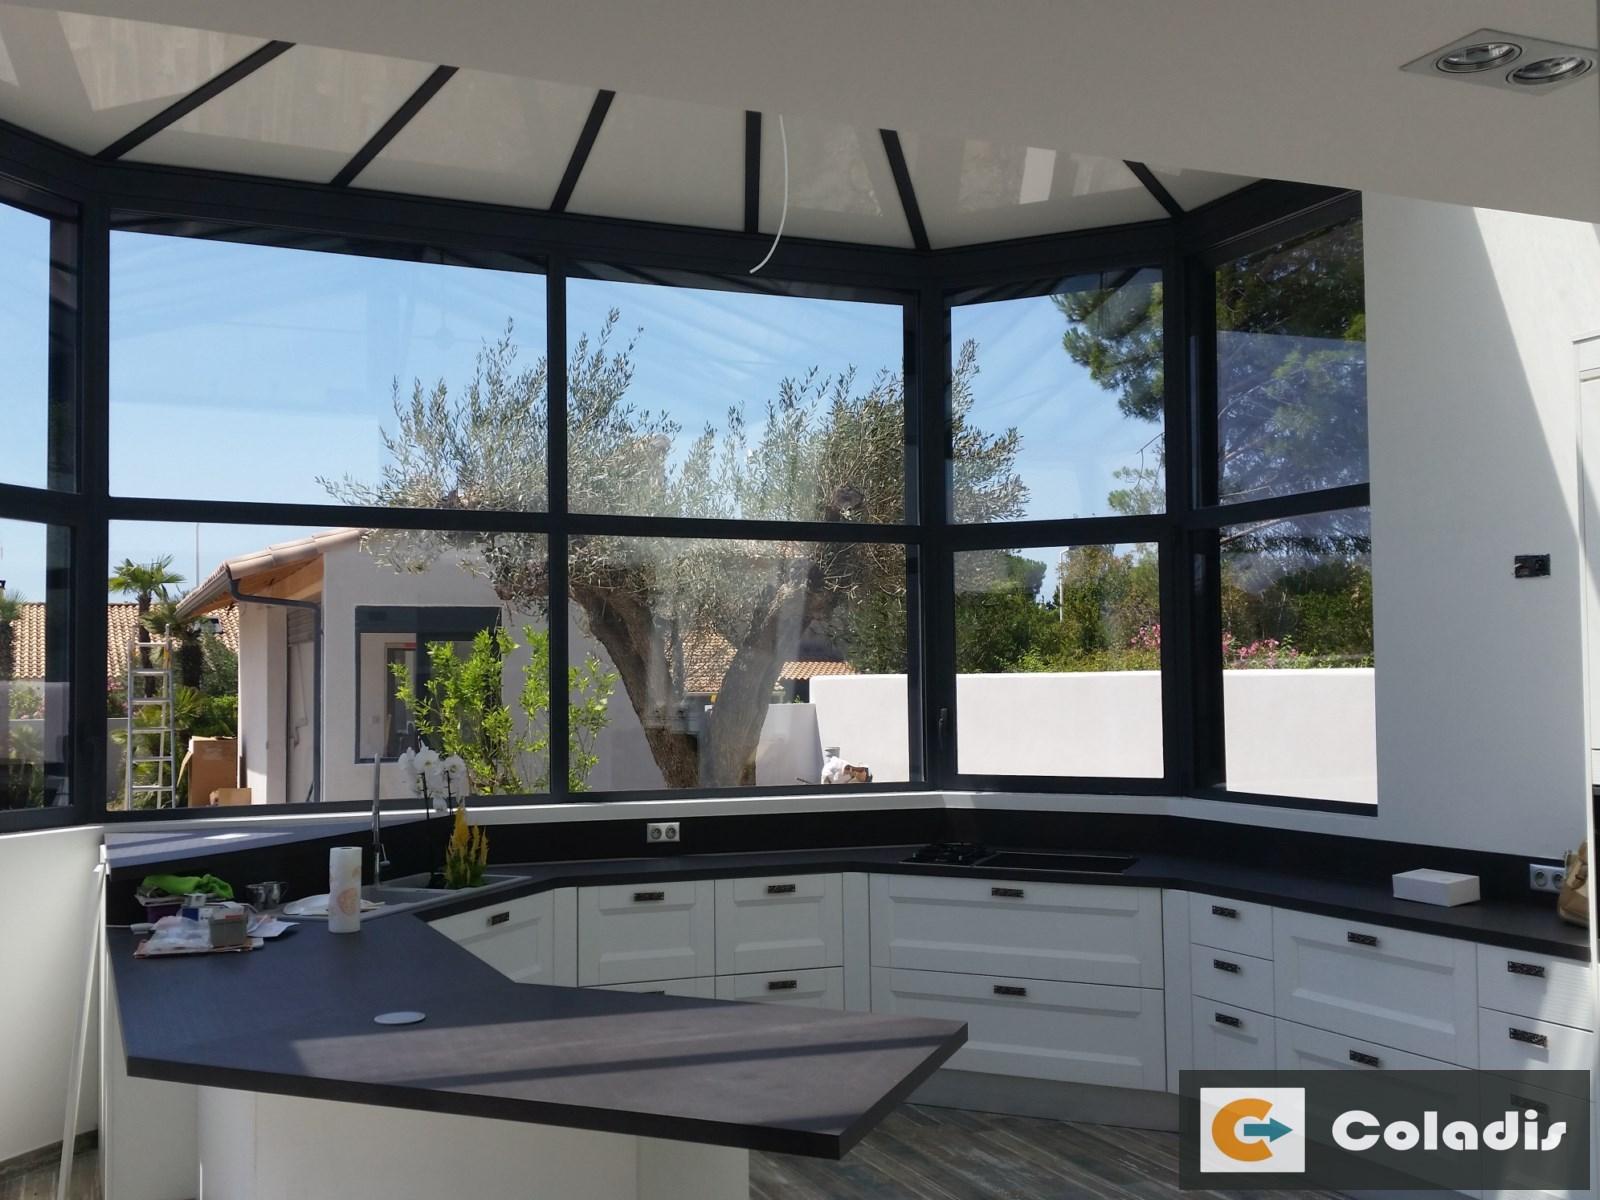 Coladis intérieur véranda aluminium aménagement cuisine vias hérault 34